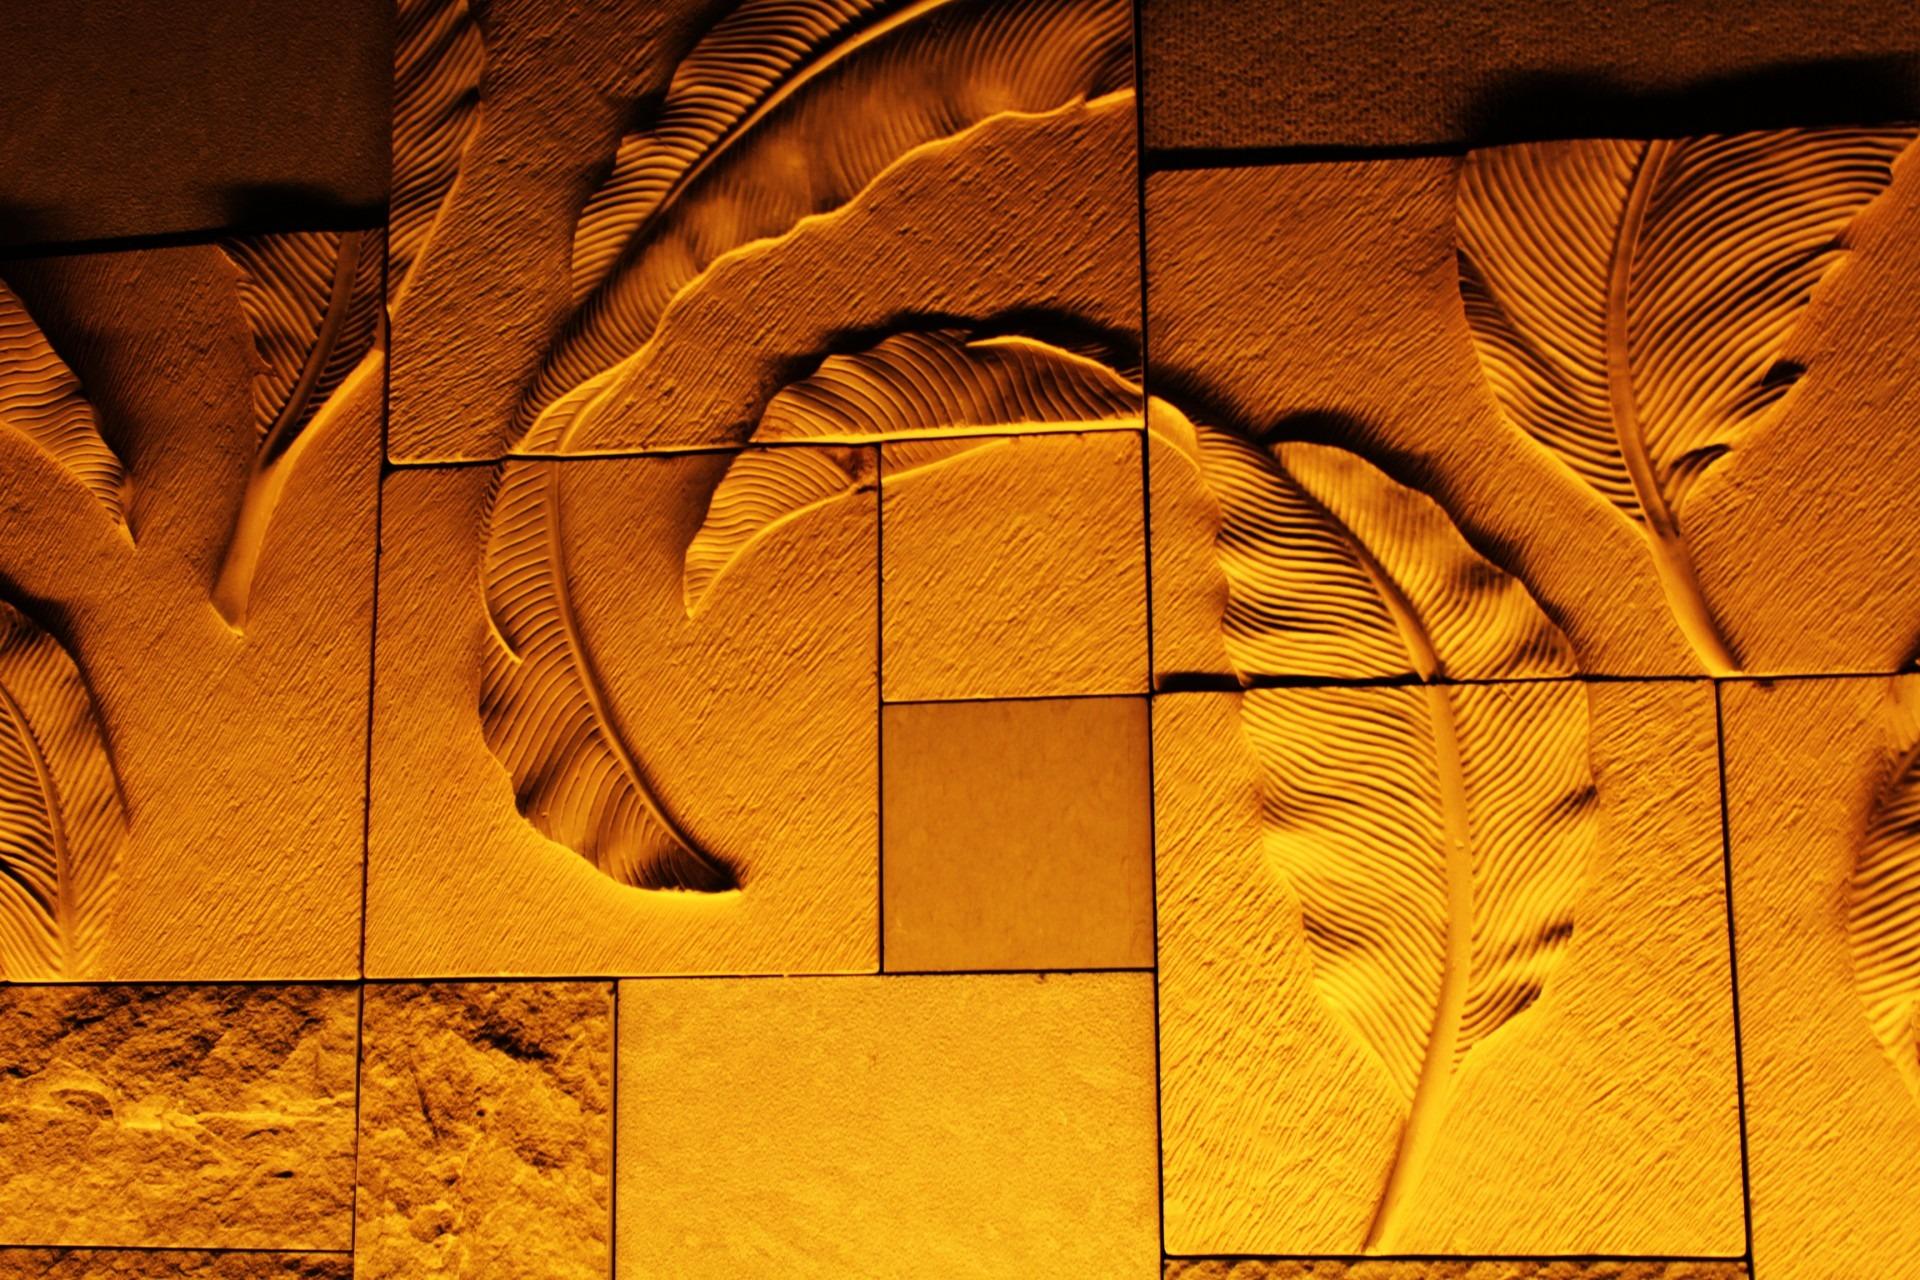 картинки дерево текстура стена Загар цвет Осень